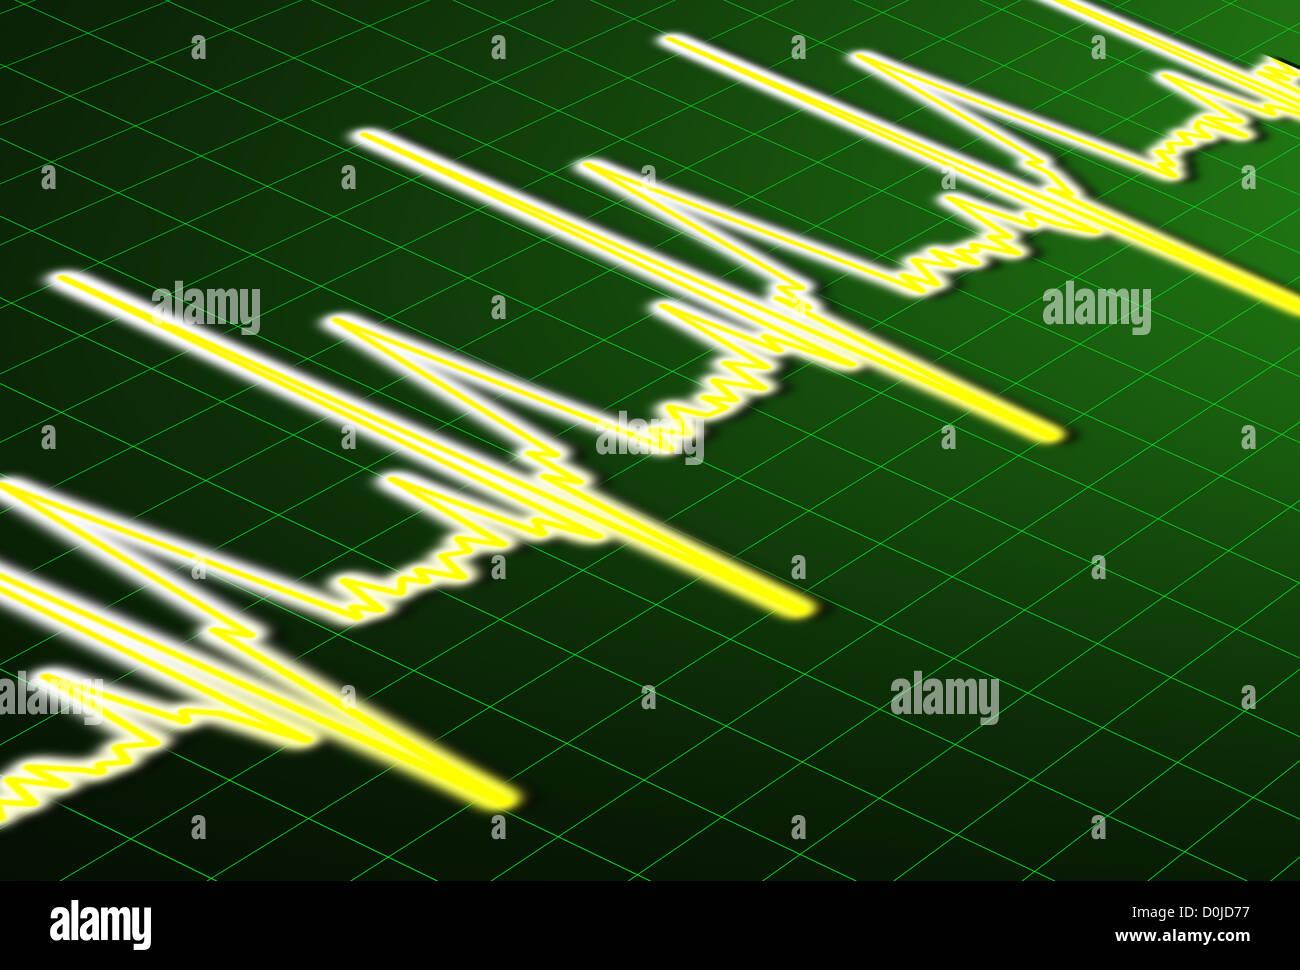 ECG - Heart Beat impulse line - Stock Image